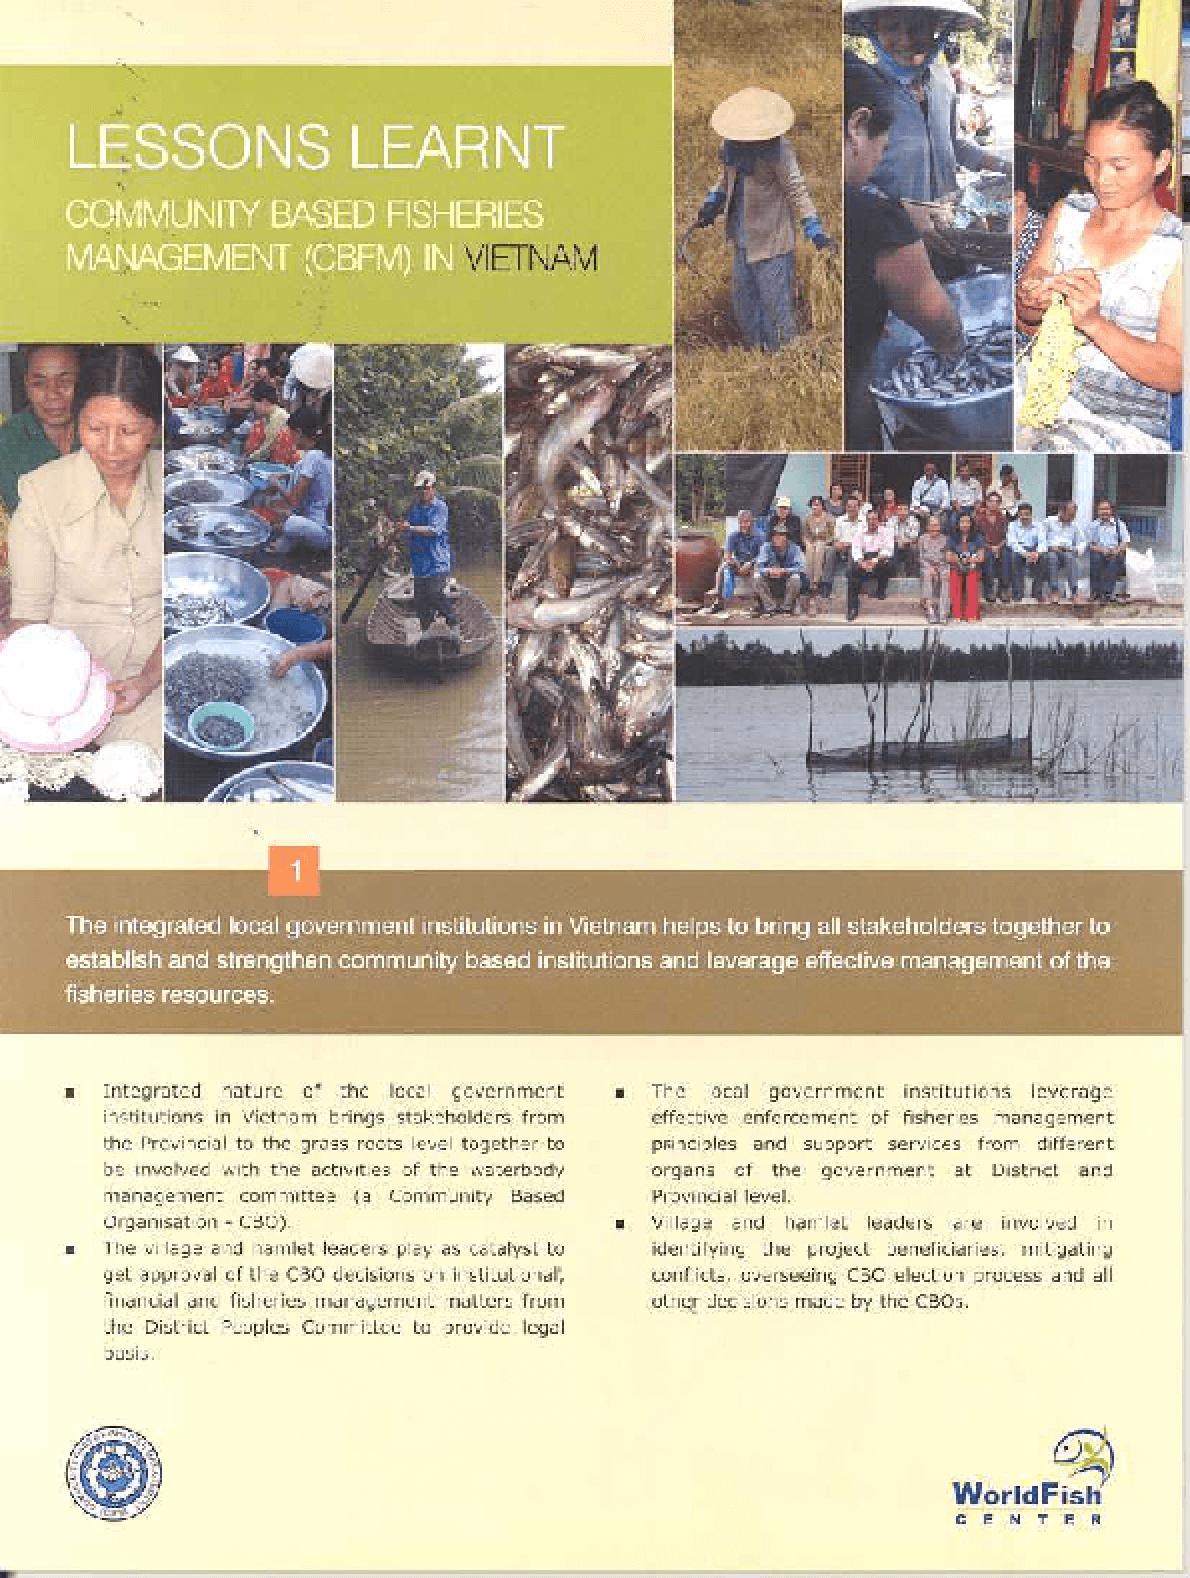 Lessons Learnt: Community Based Fisheries Management (CBFM) in Vietnam